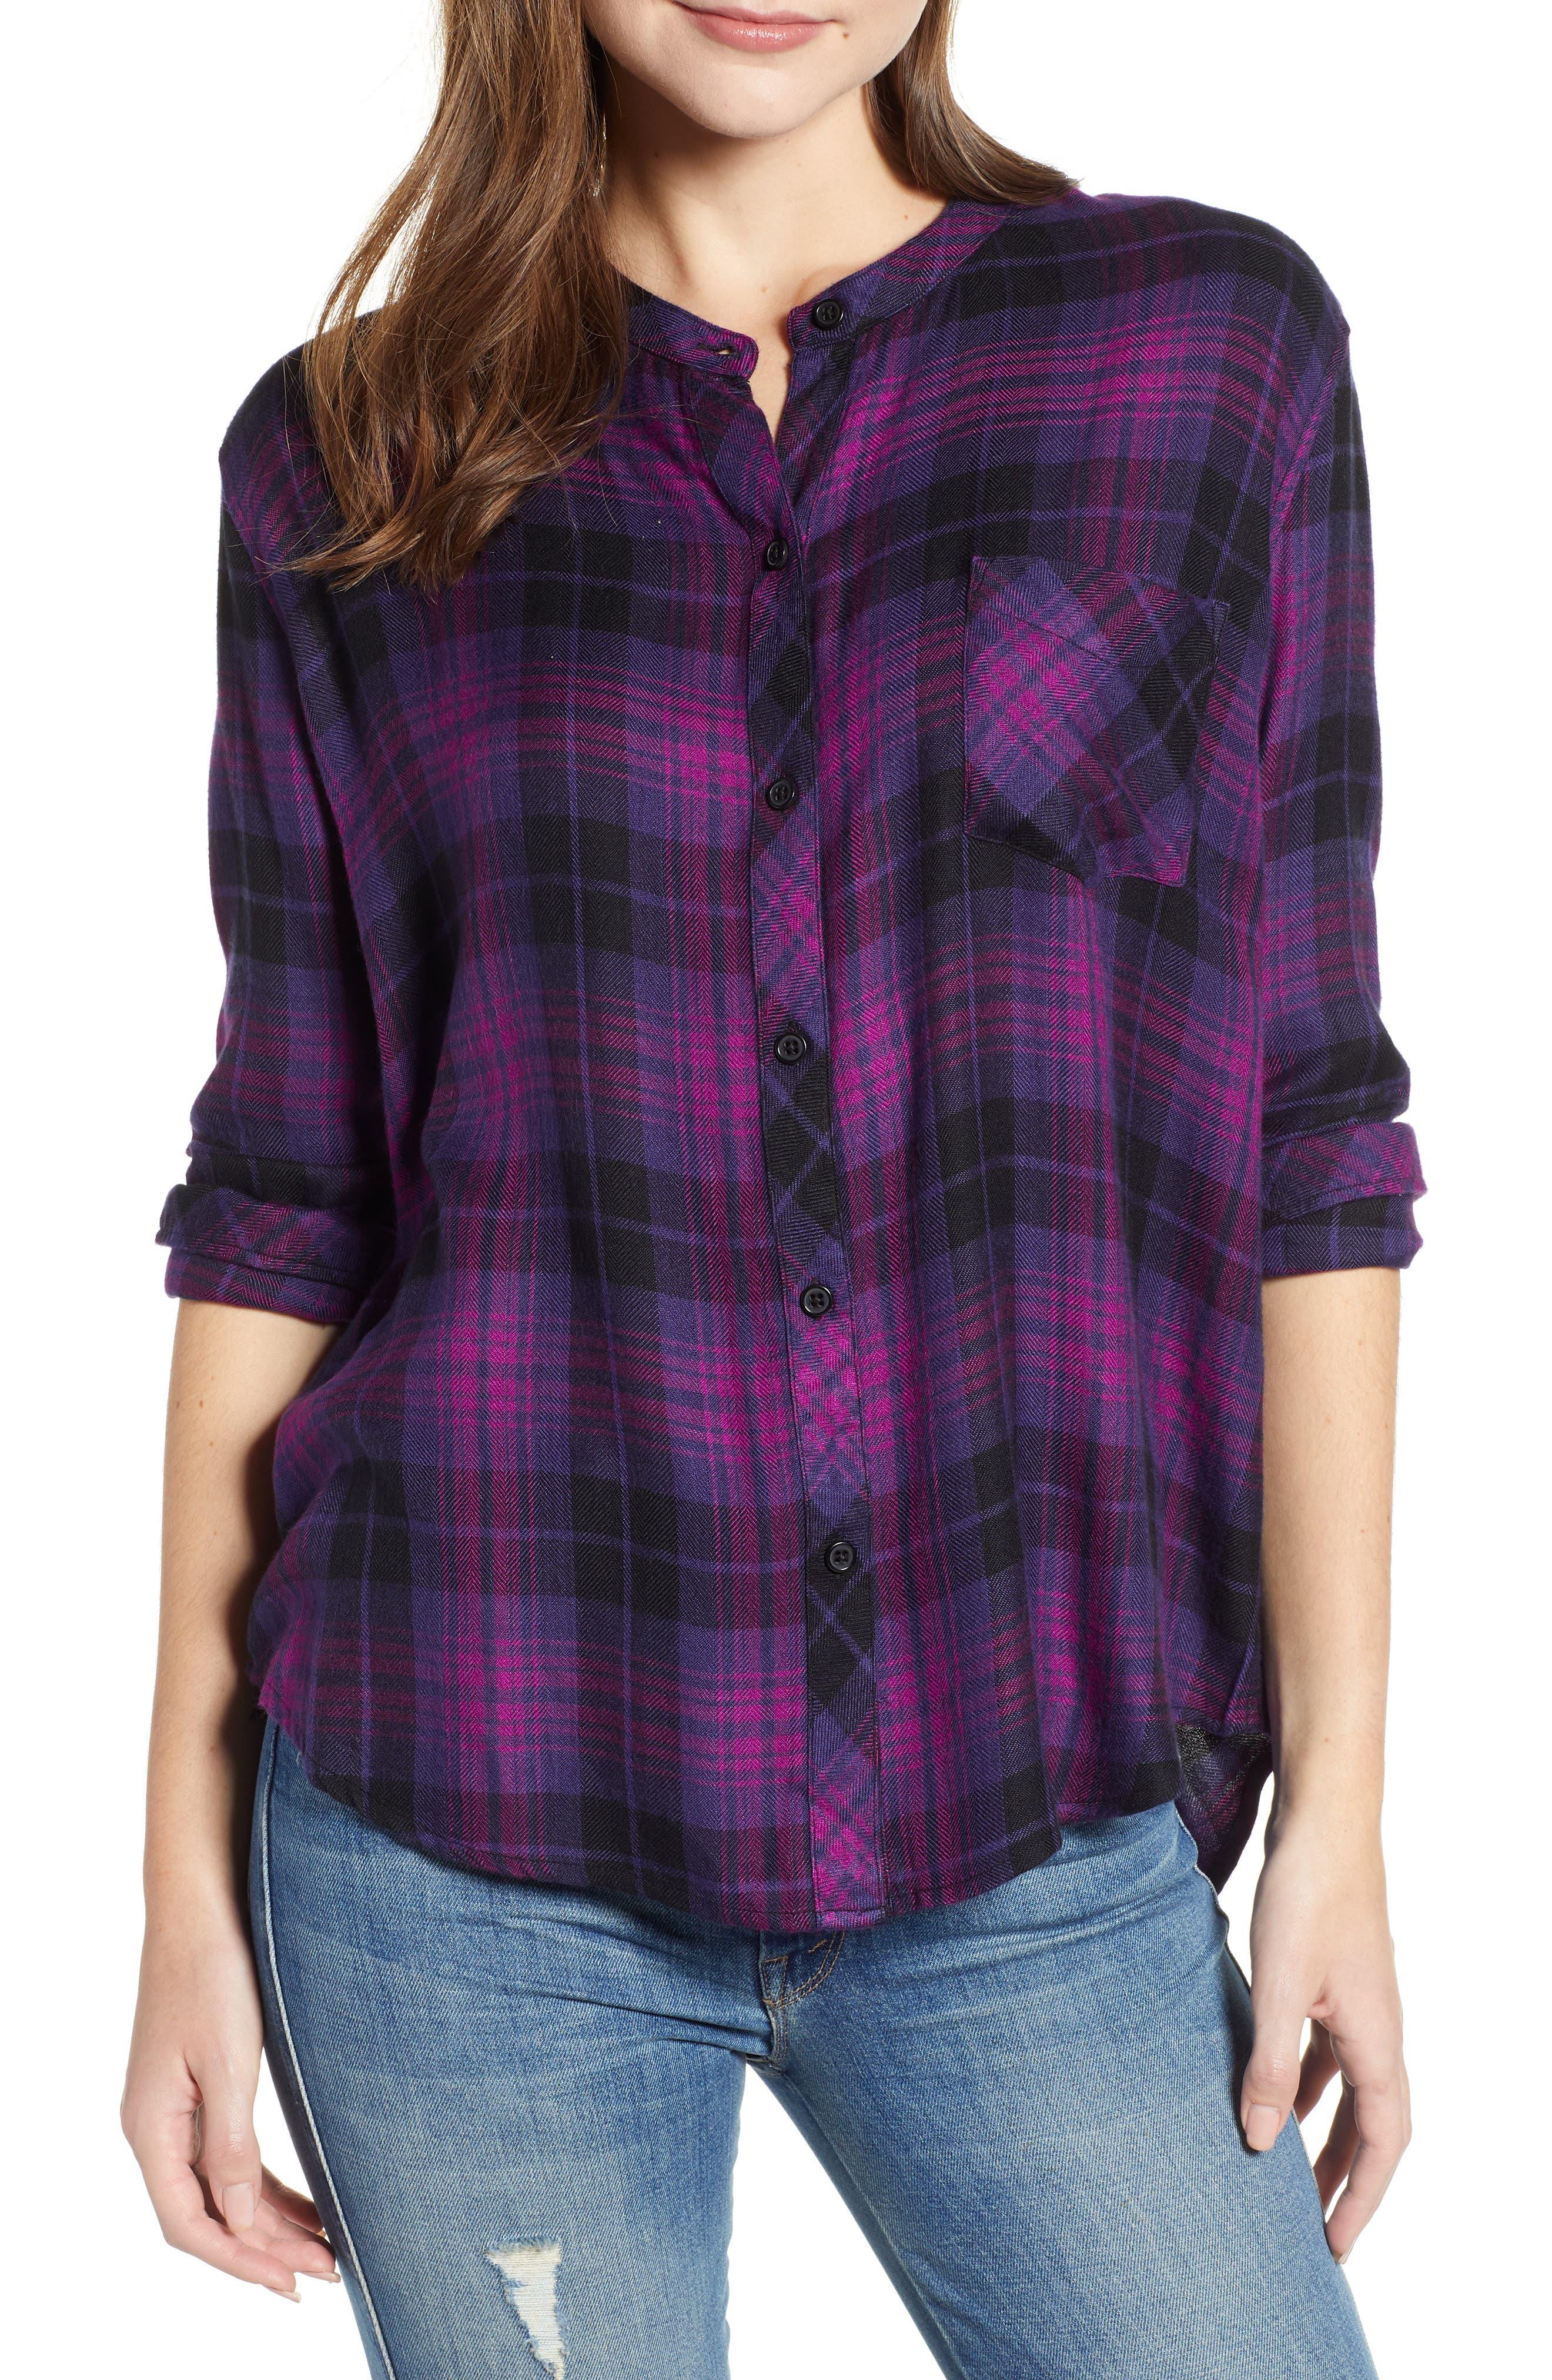 Allison Plaid Shirt,                         Main,                         color, MAGENTA IRIS BLACK